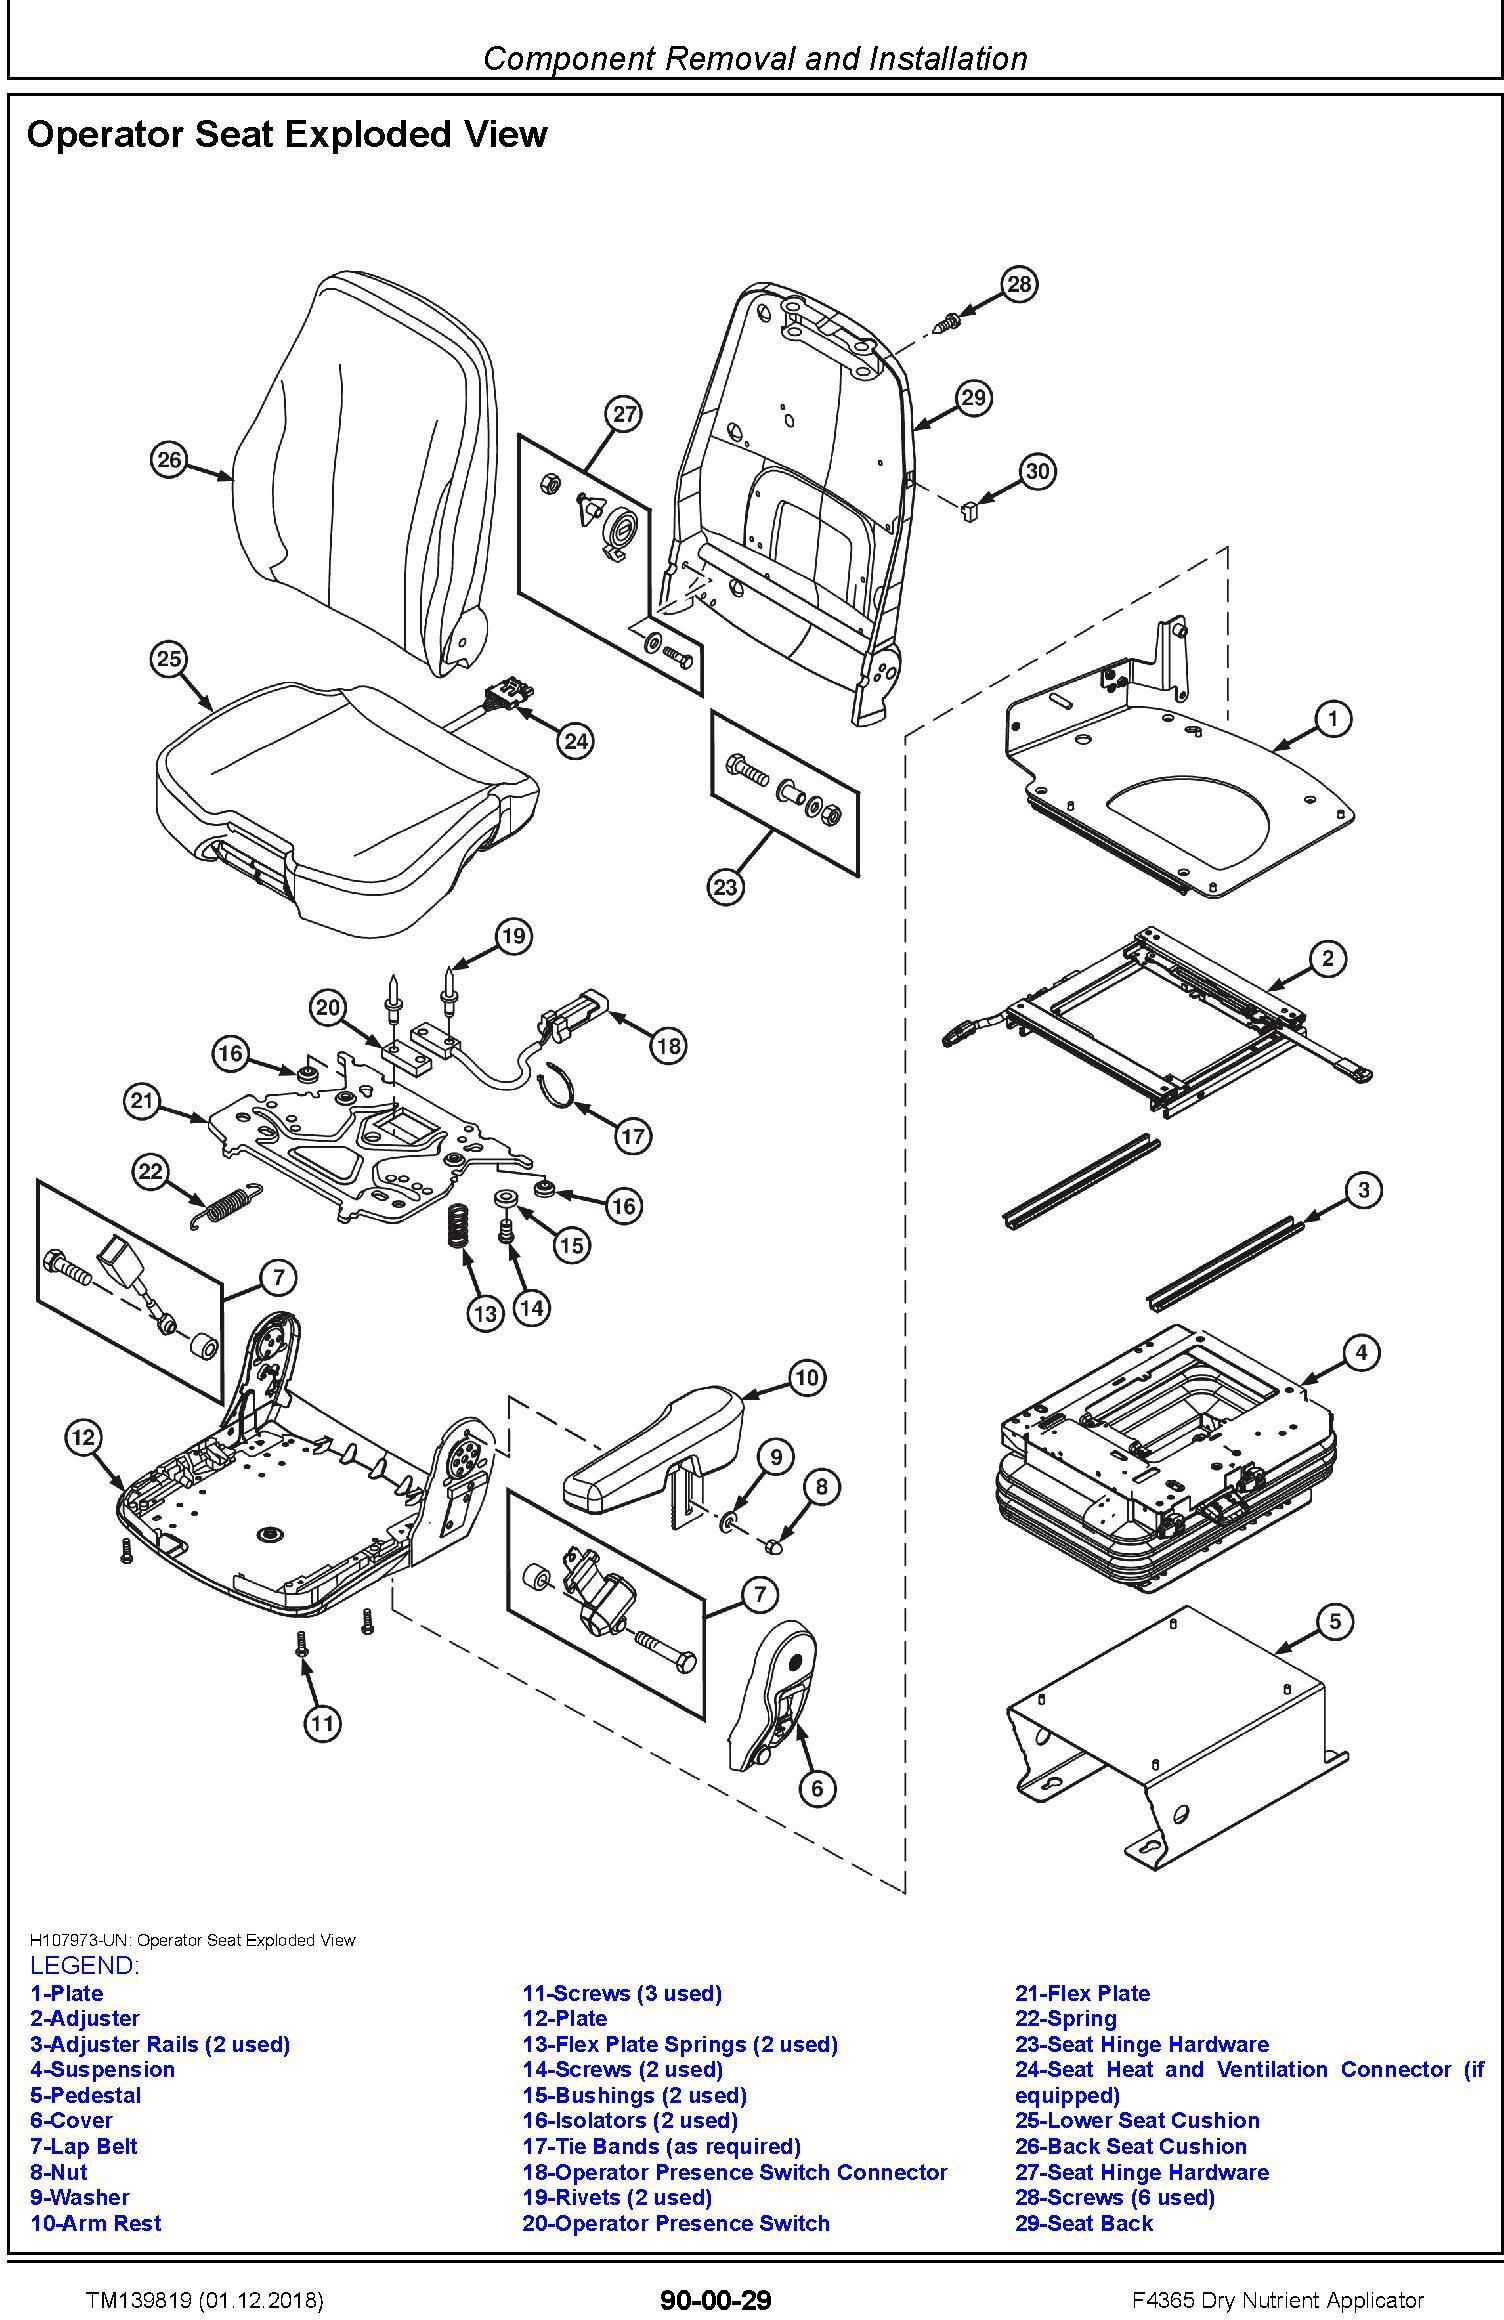 John Deere F4365 Dry Nutrient Applicator Service Repair Technical Manual (TM139819) - 3